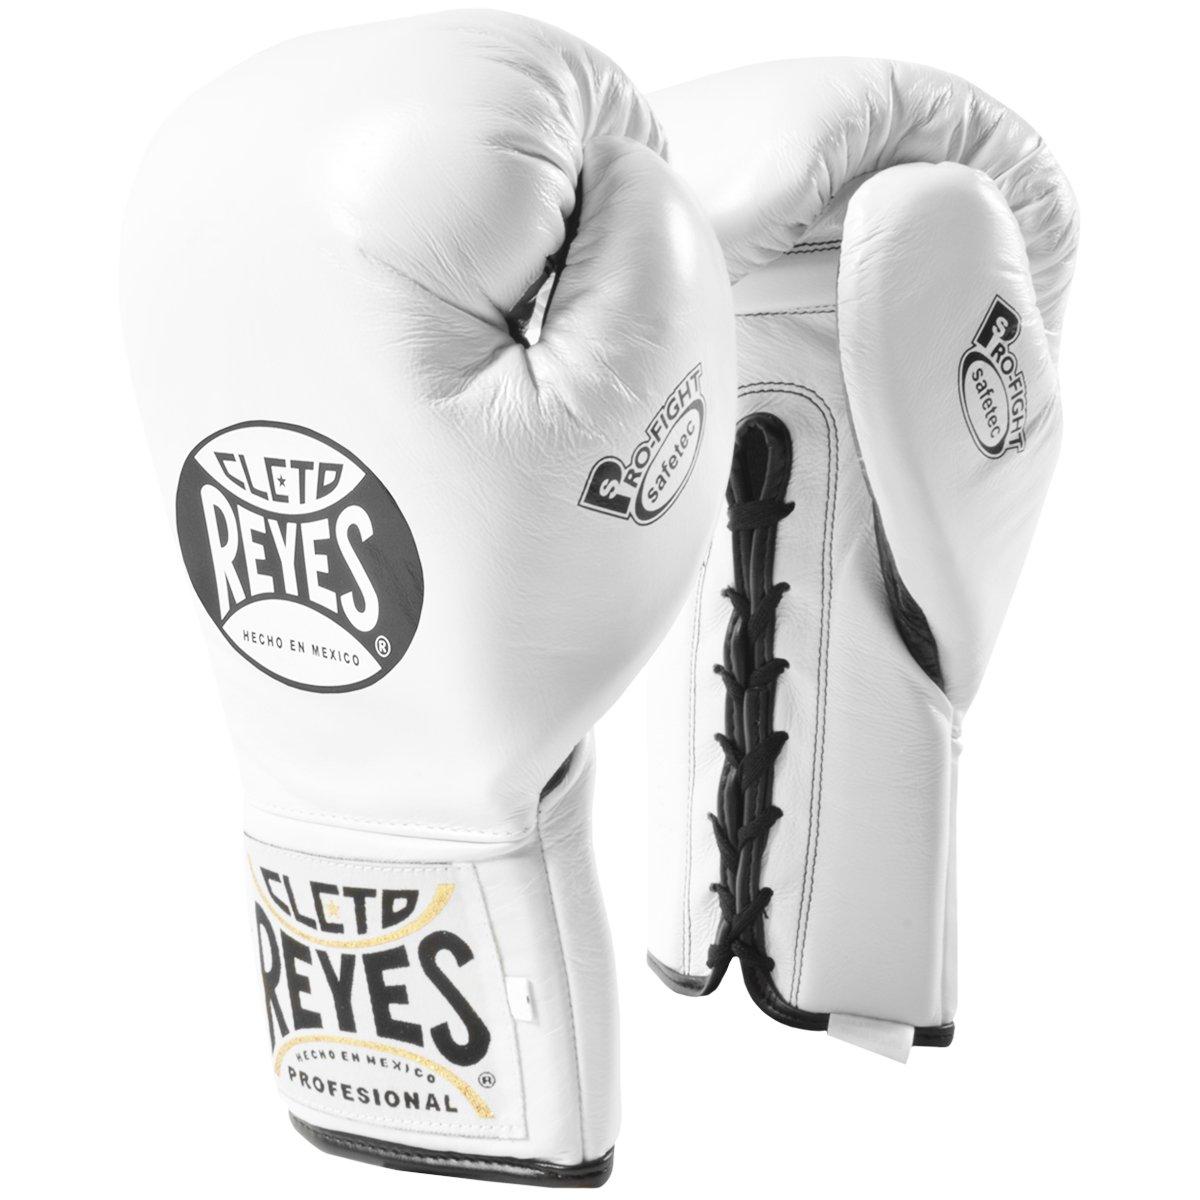 Cleto Reyes Safetec Professional Boxing Fight手袋 – ホワイト  8 oz.